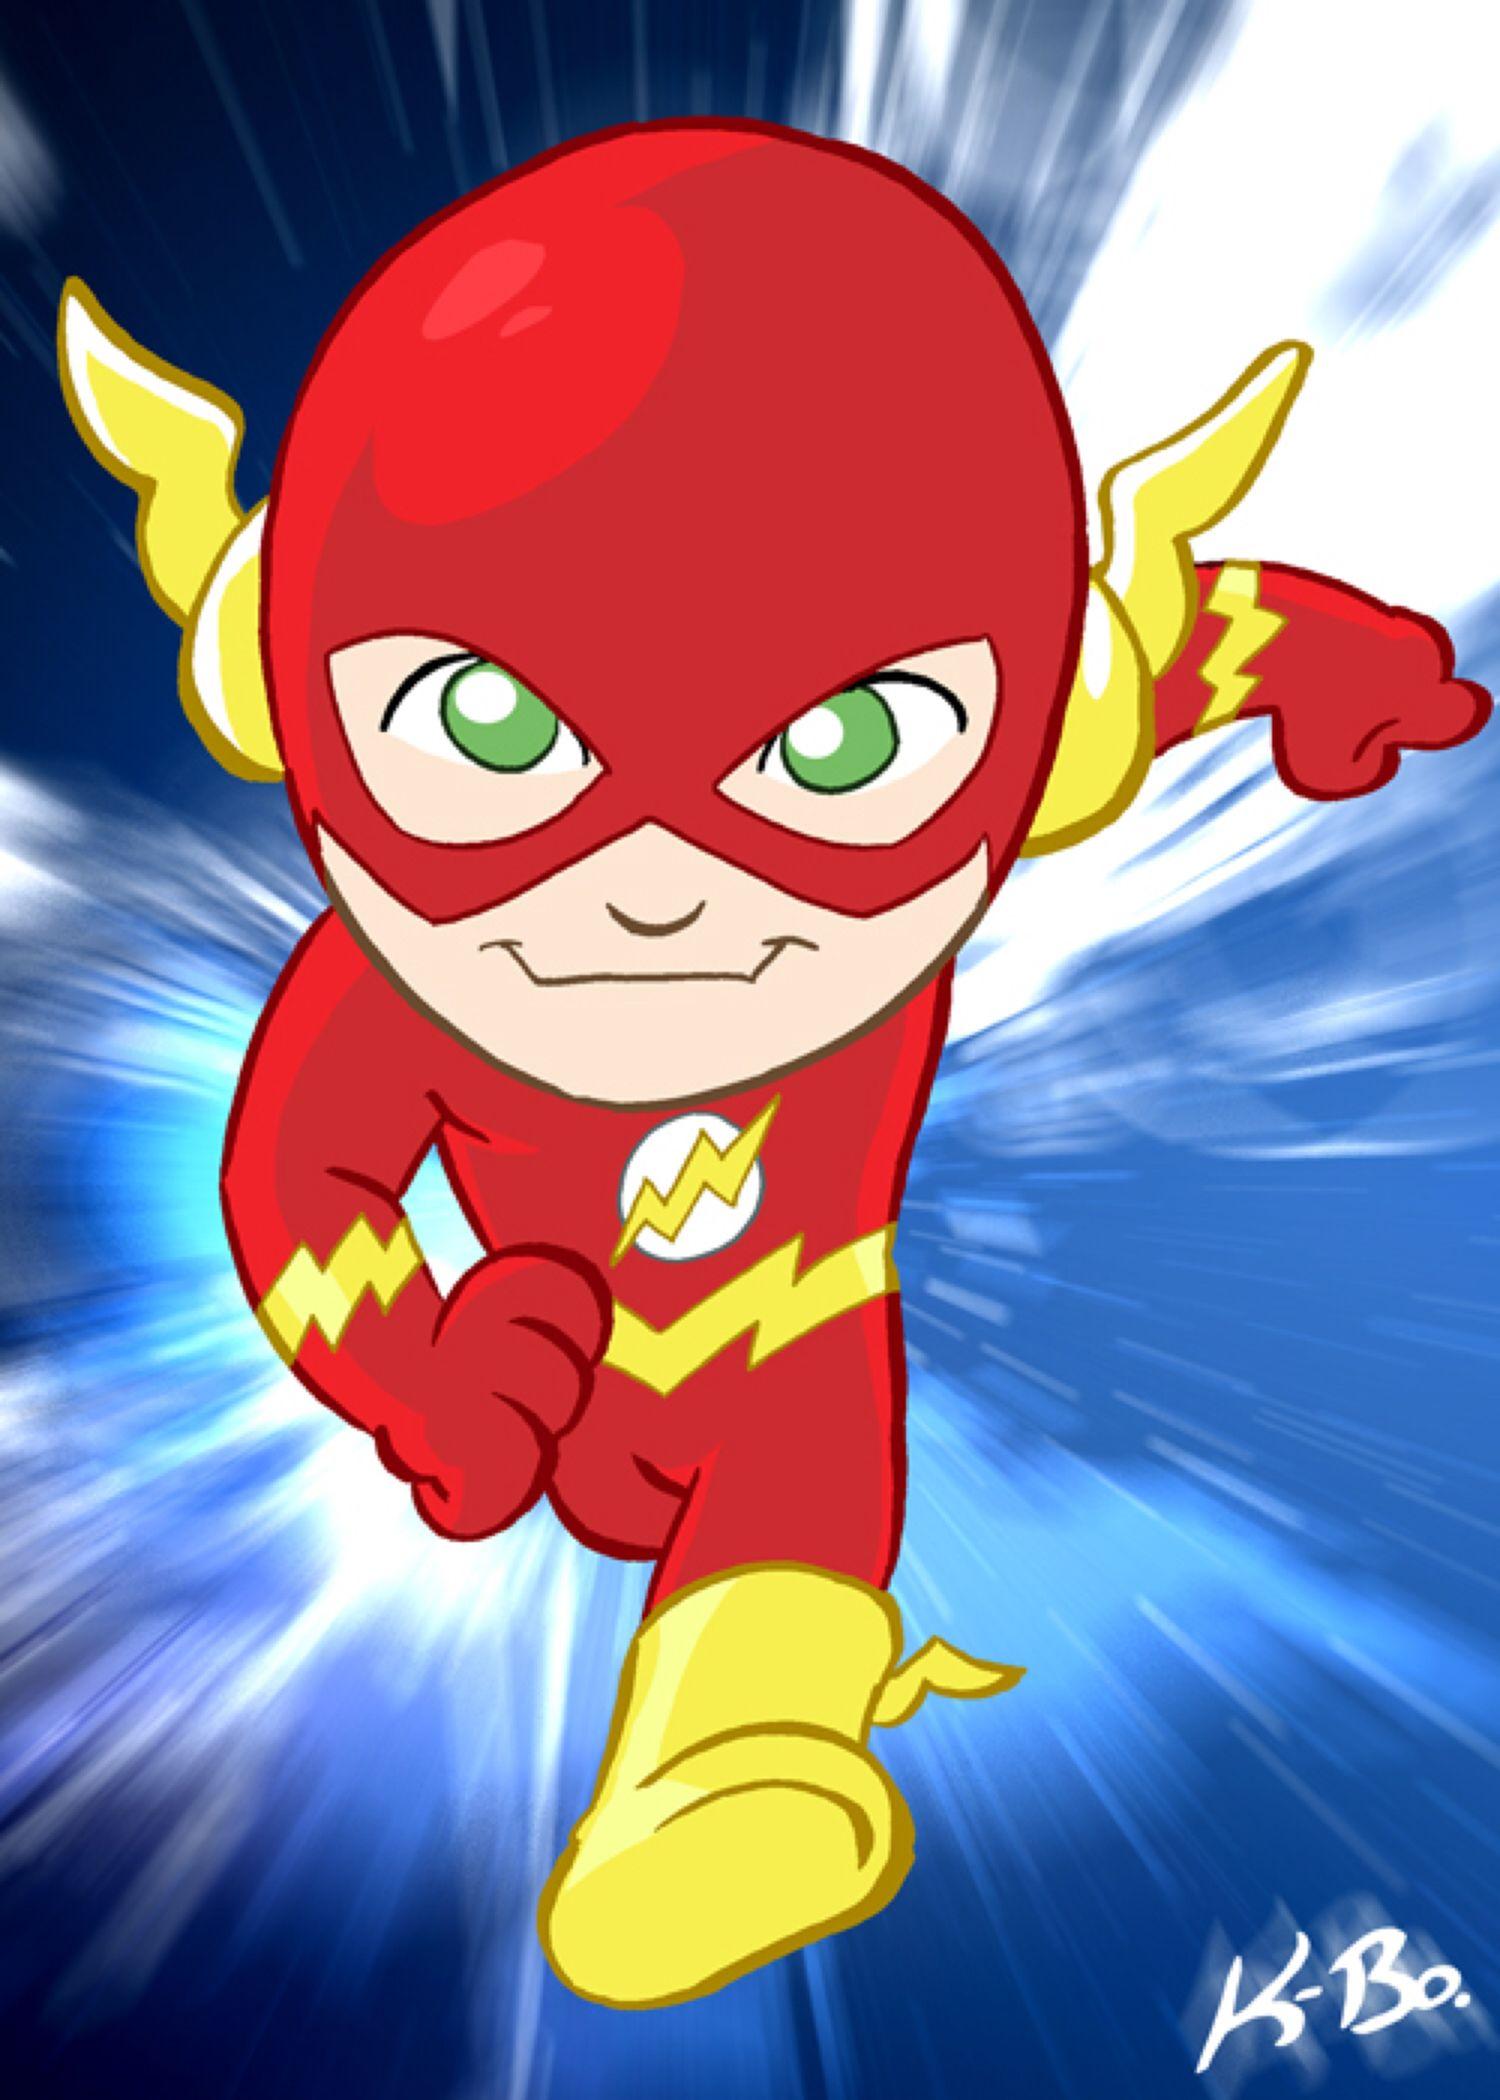 The Flash Art Card By Kevinbolk On Deviantart Flash Dibujo